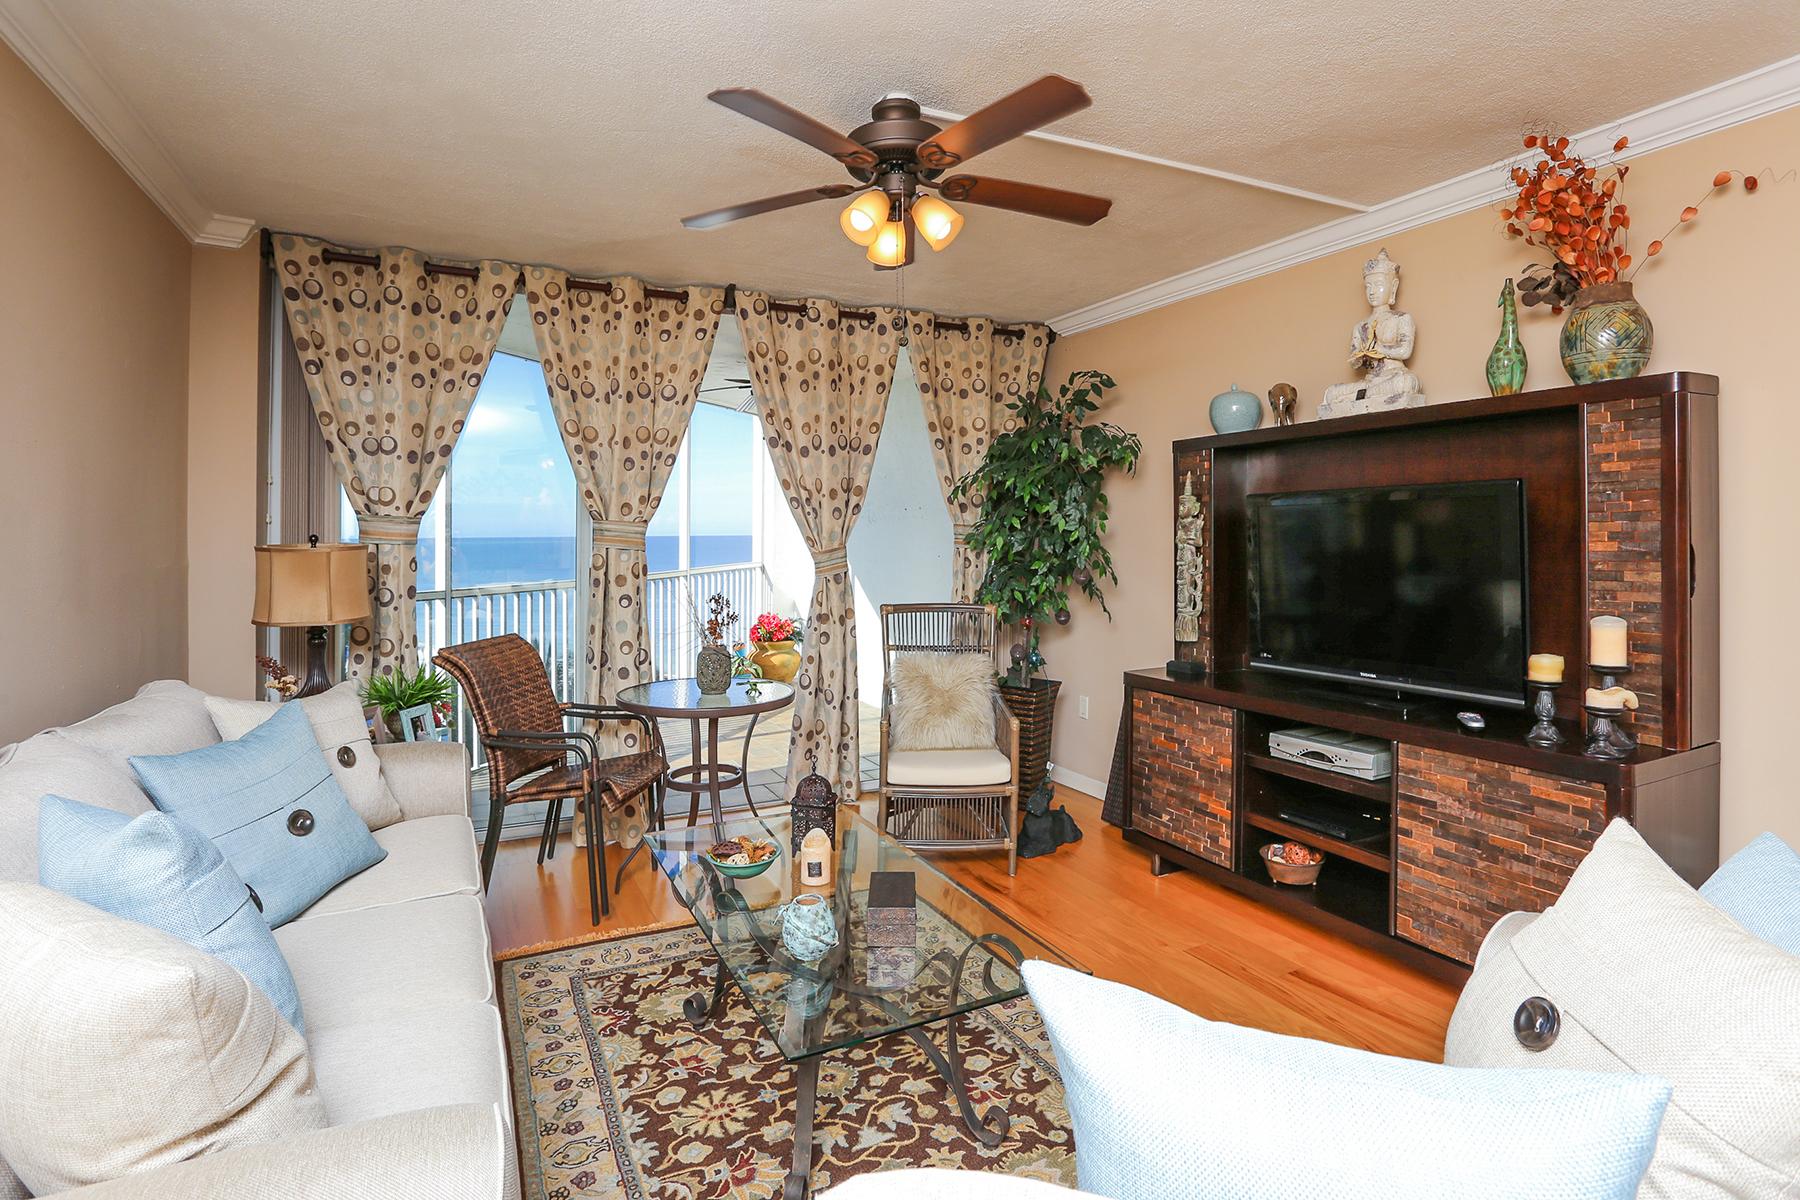 Condominio por un Alquiler en SARASOTA - LIDO HAROUR TOWERS 1770 Ben Franklin Dr 603 Sarasota, Florida 34236 Estados Unidos